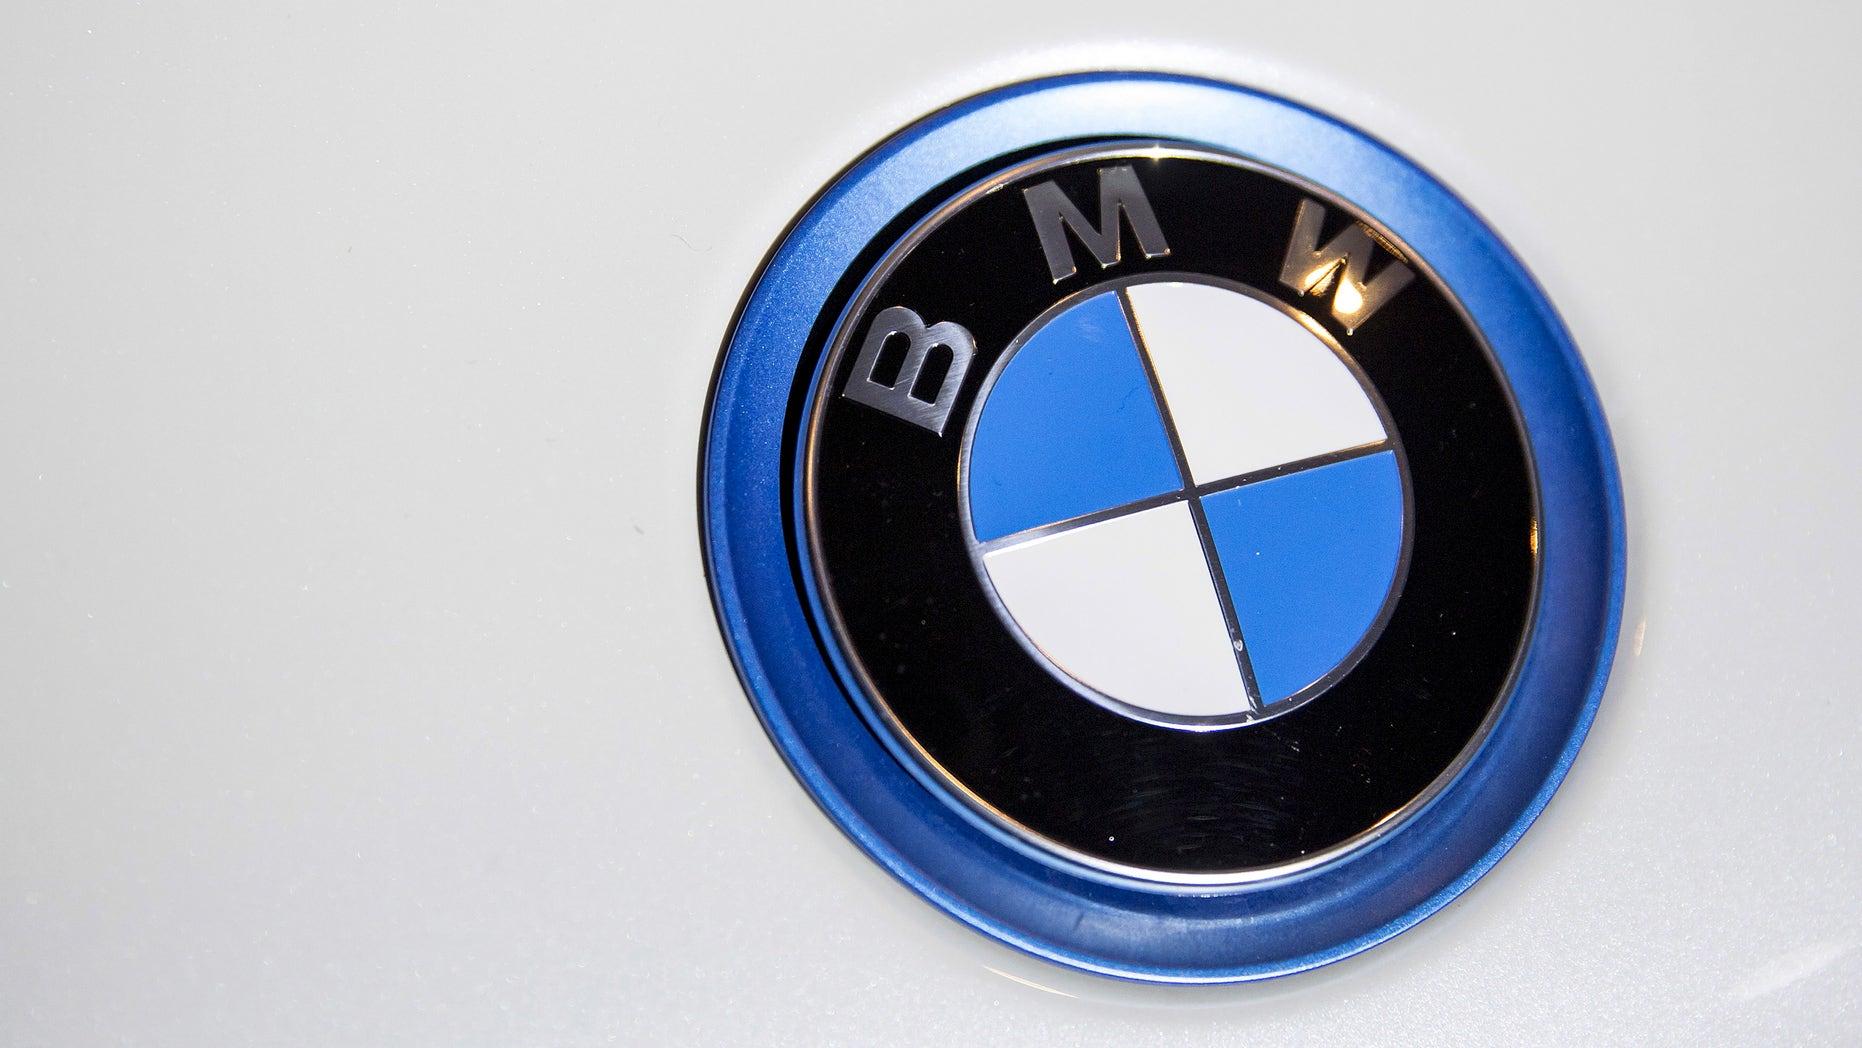 Bmw Recalls Baby Racer Toy Car Over Health Hazard Fox News